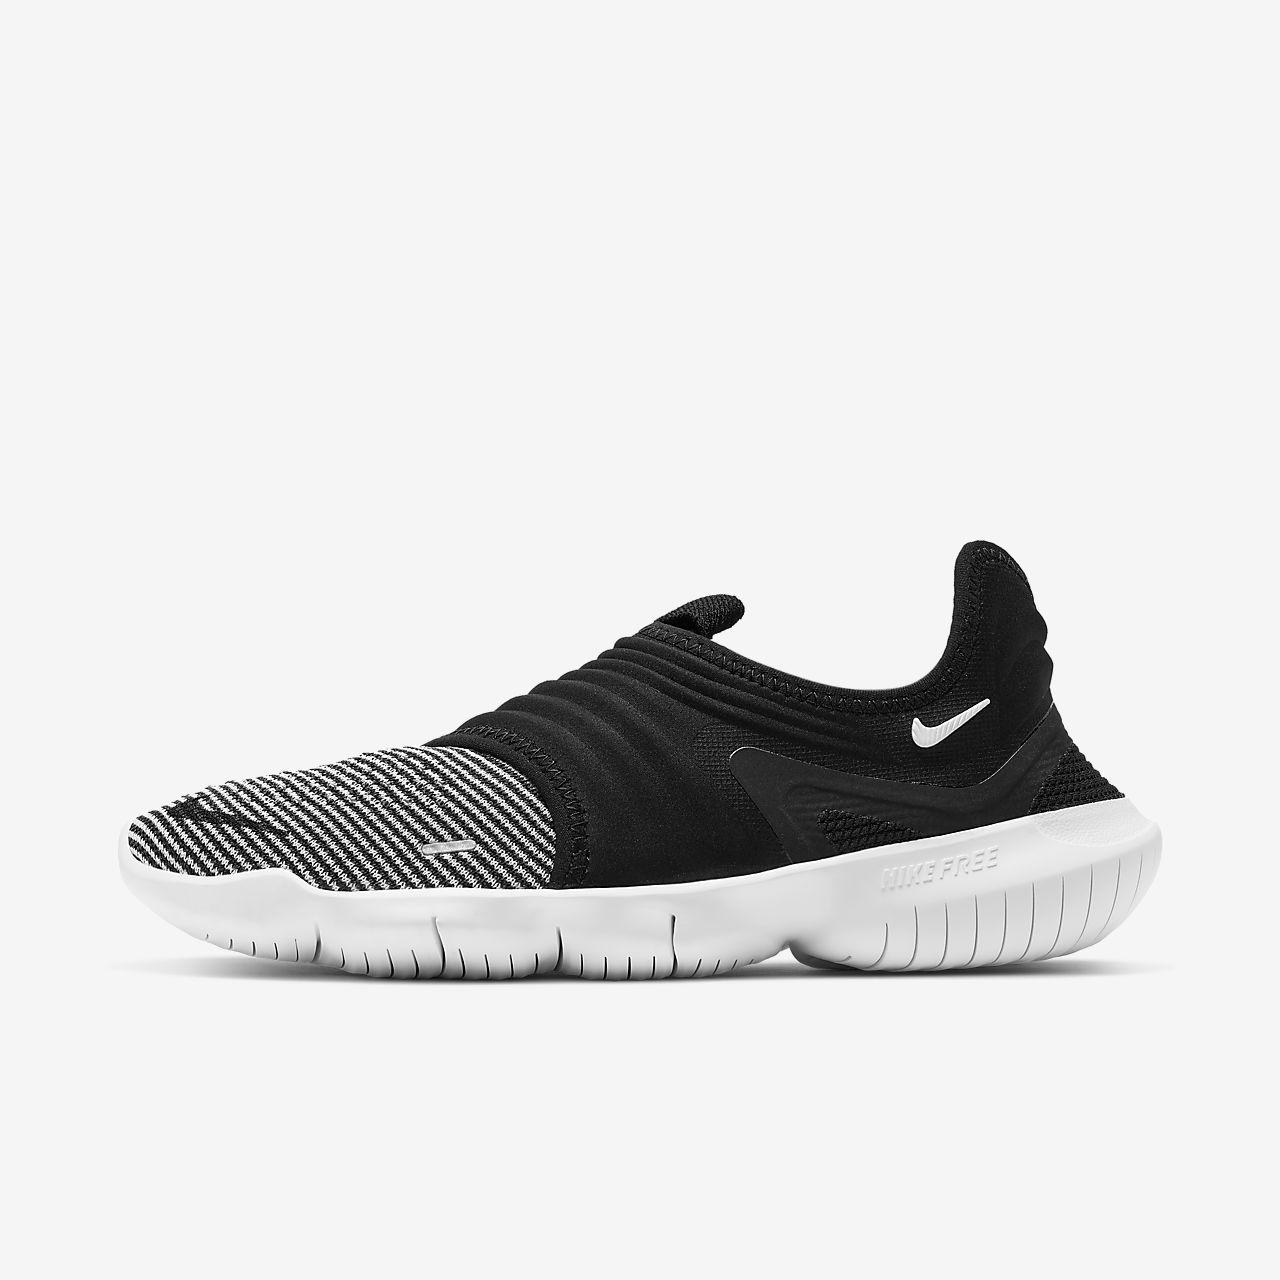 Nike Free RN Flyknit 3.0 Damen Laufschuh